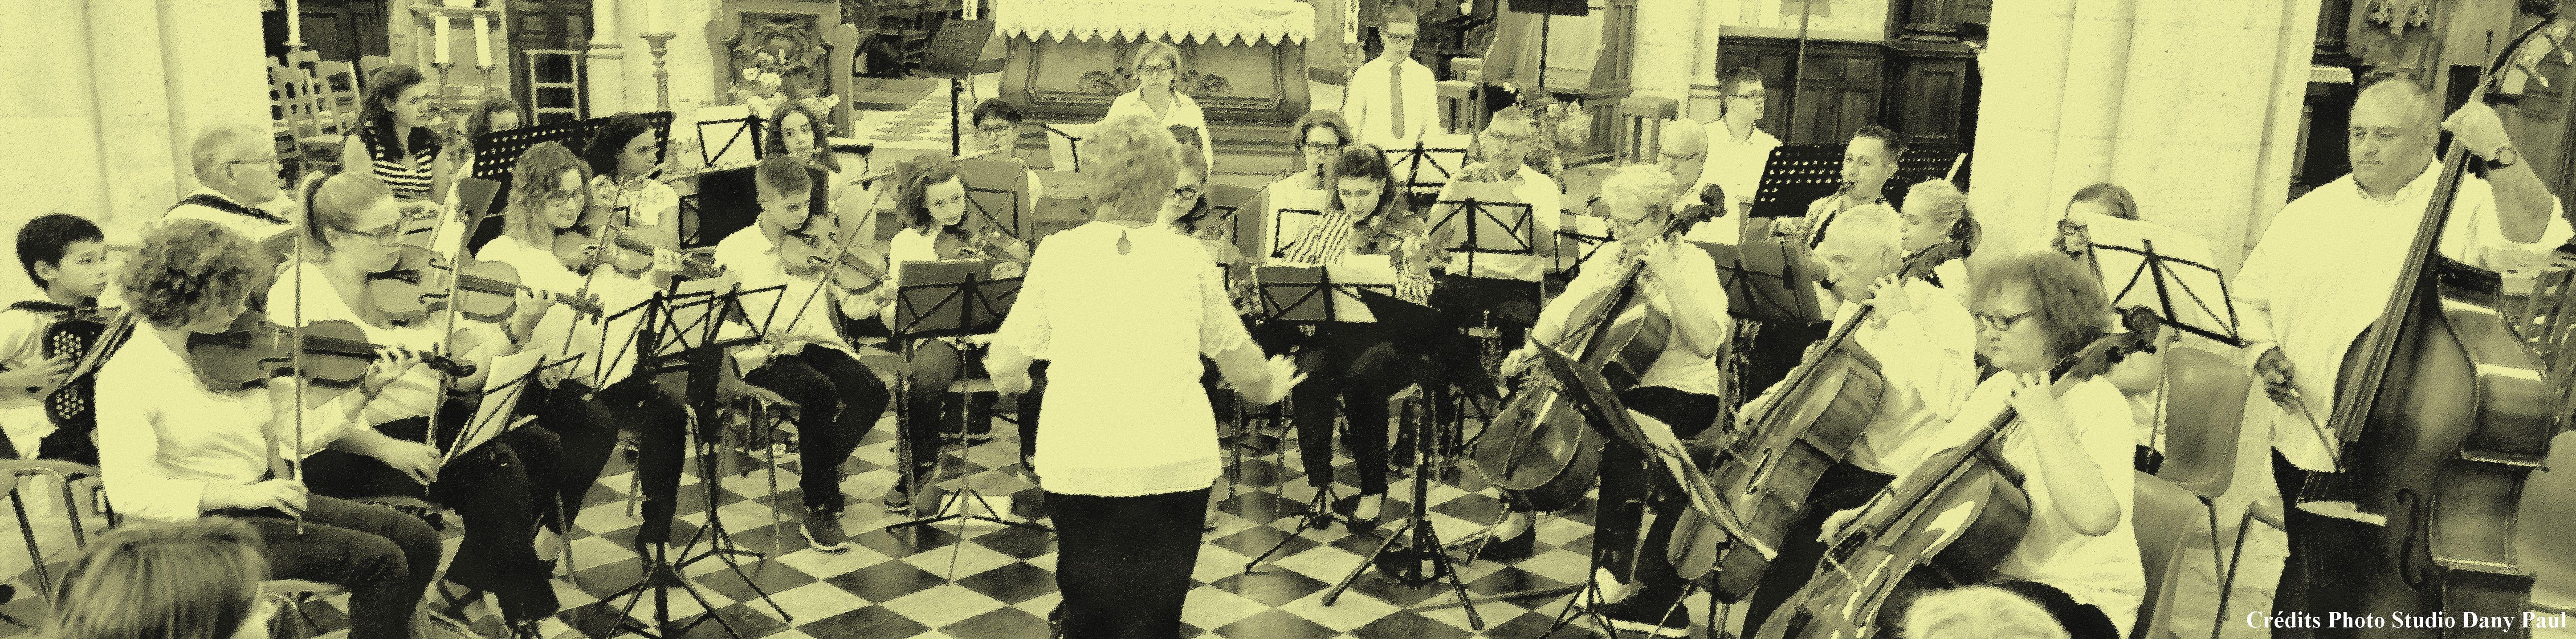 Orchestre 2019